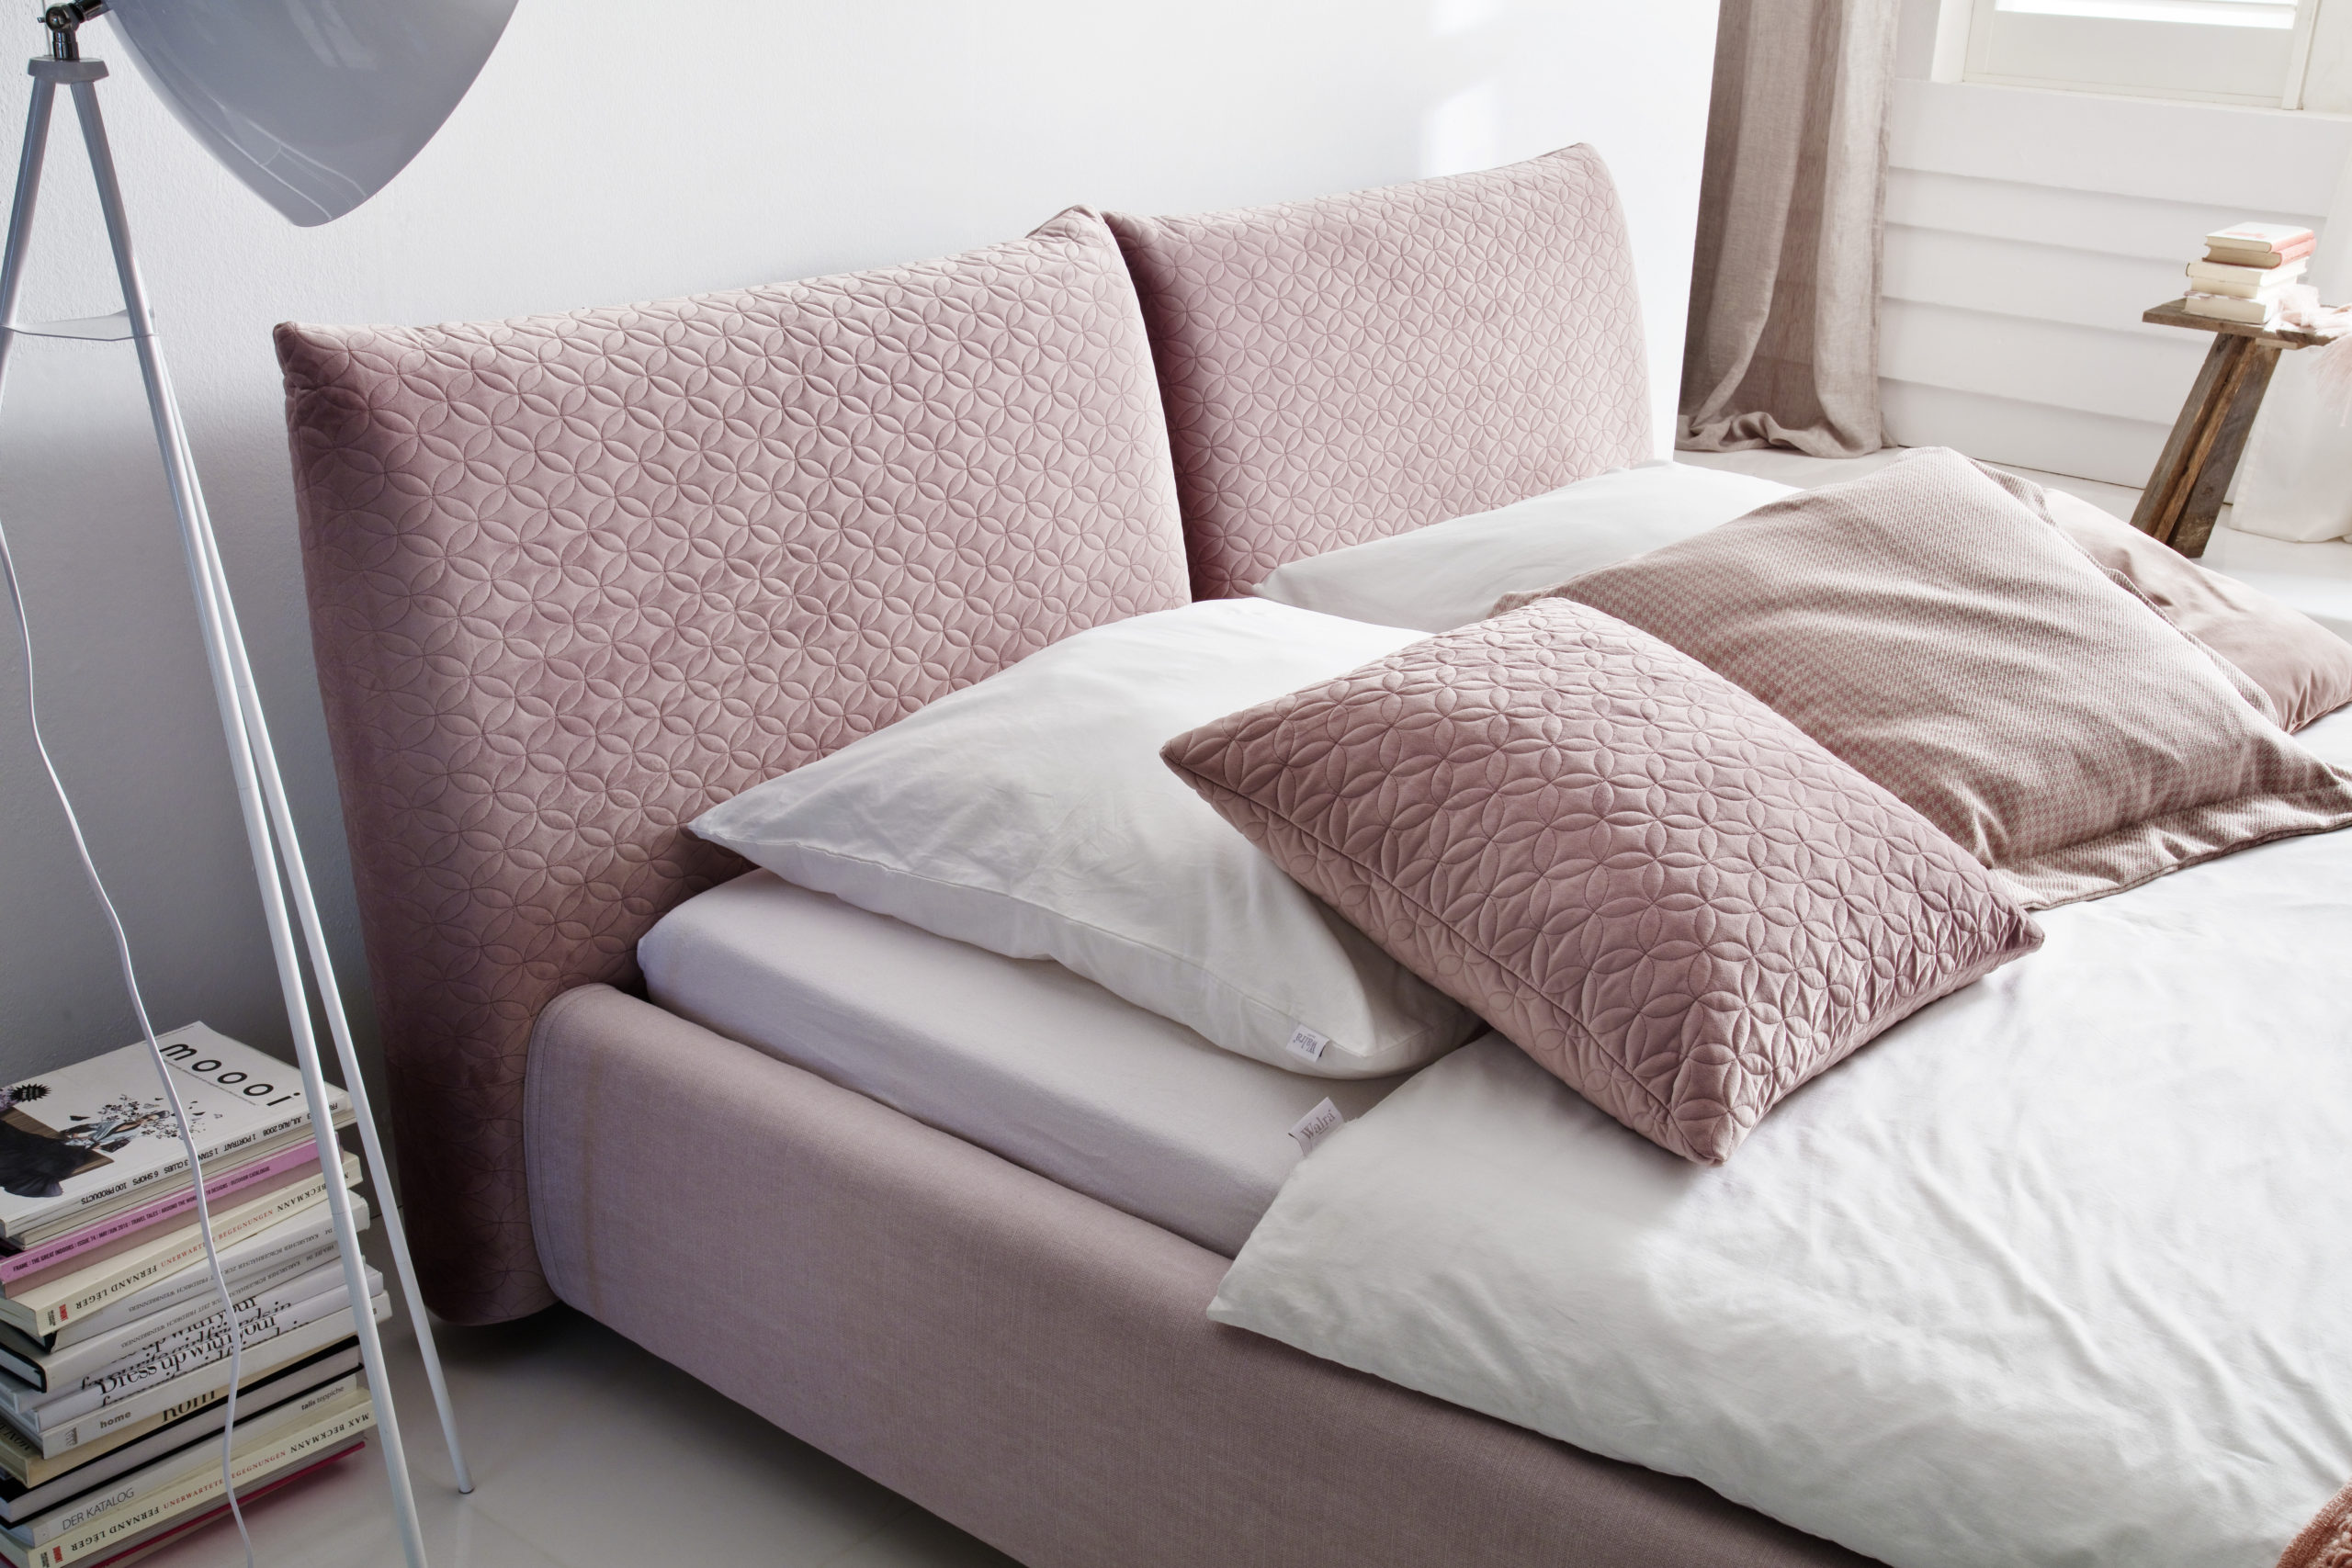 Homelike 180x200 Daisy rosewood Kopfteil 2 scaled - Dormitor Homelike 3C Candy Polstermoebel